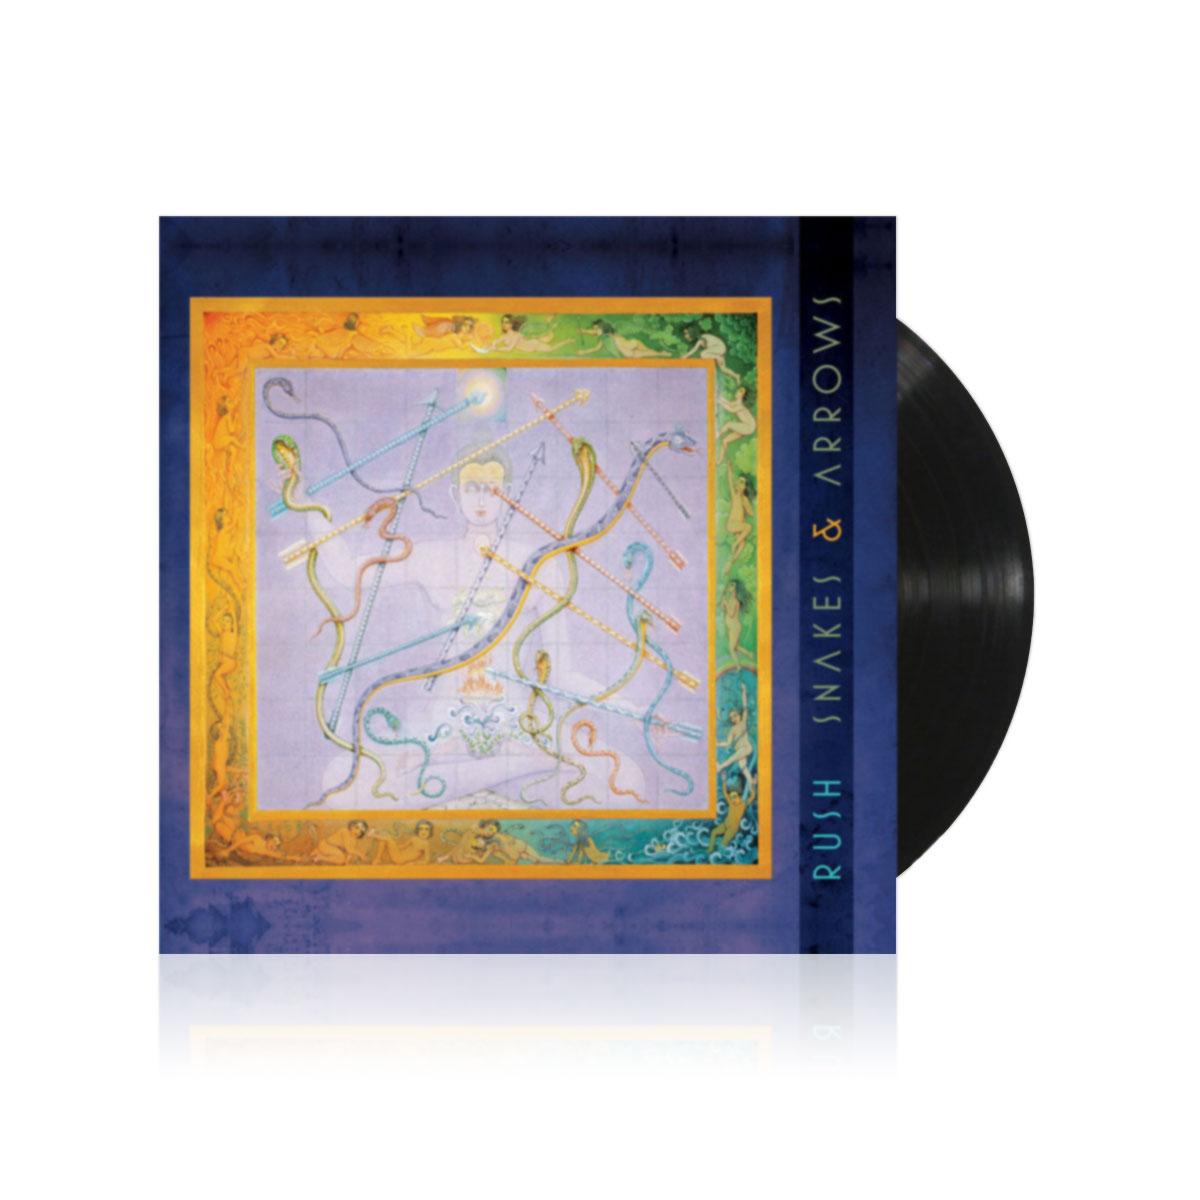 Snakes Shiva Tee/Vinyl Bundle